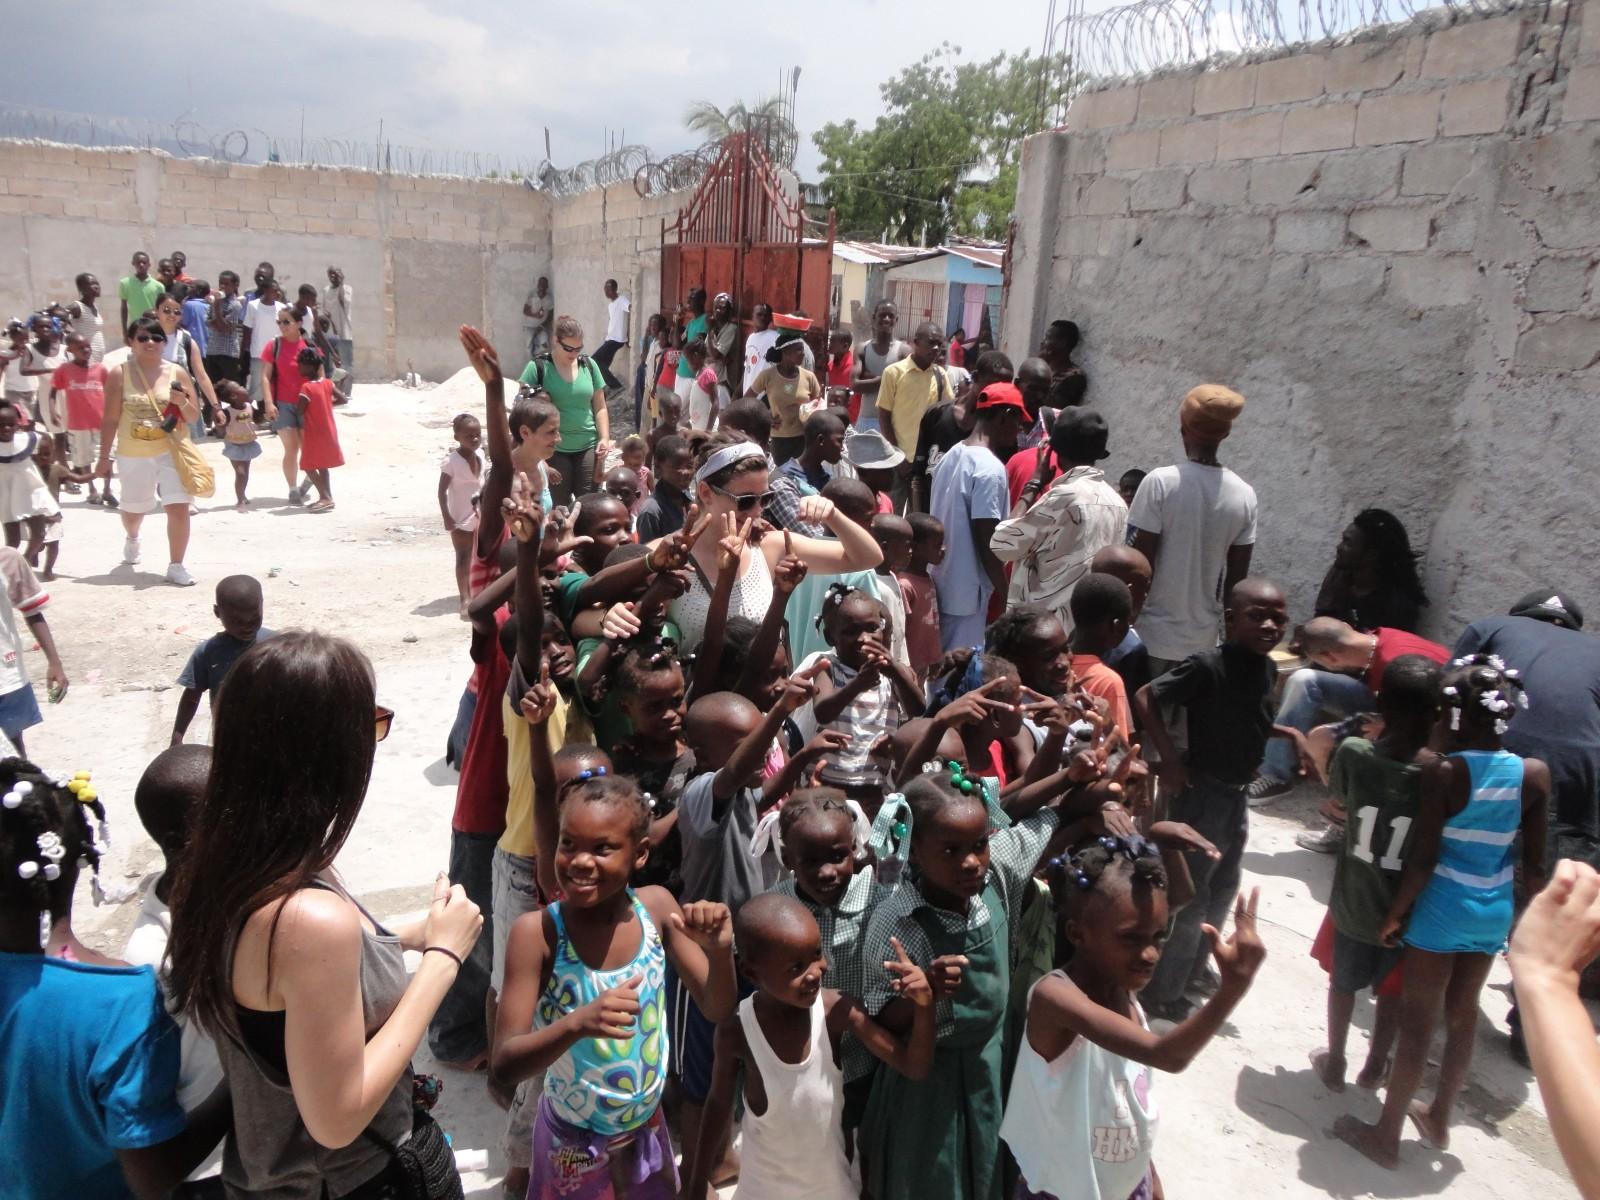 2013, Haiti, Cité Soleil, TWA, Third World Awareness, children, Haitian, kids, playing, education, learning, friends, volunteers, school